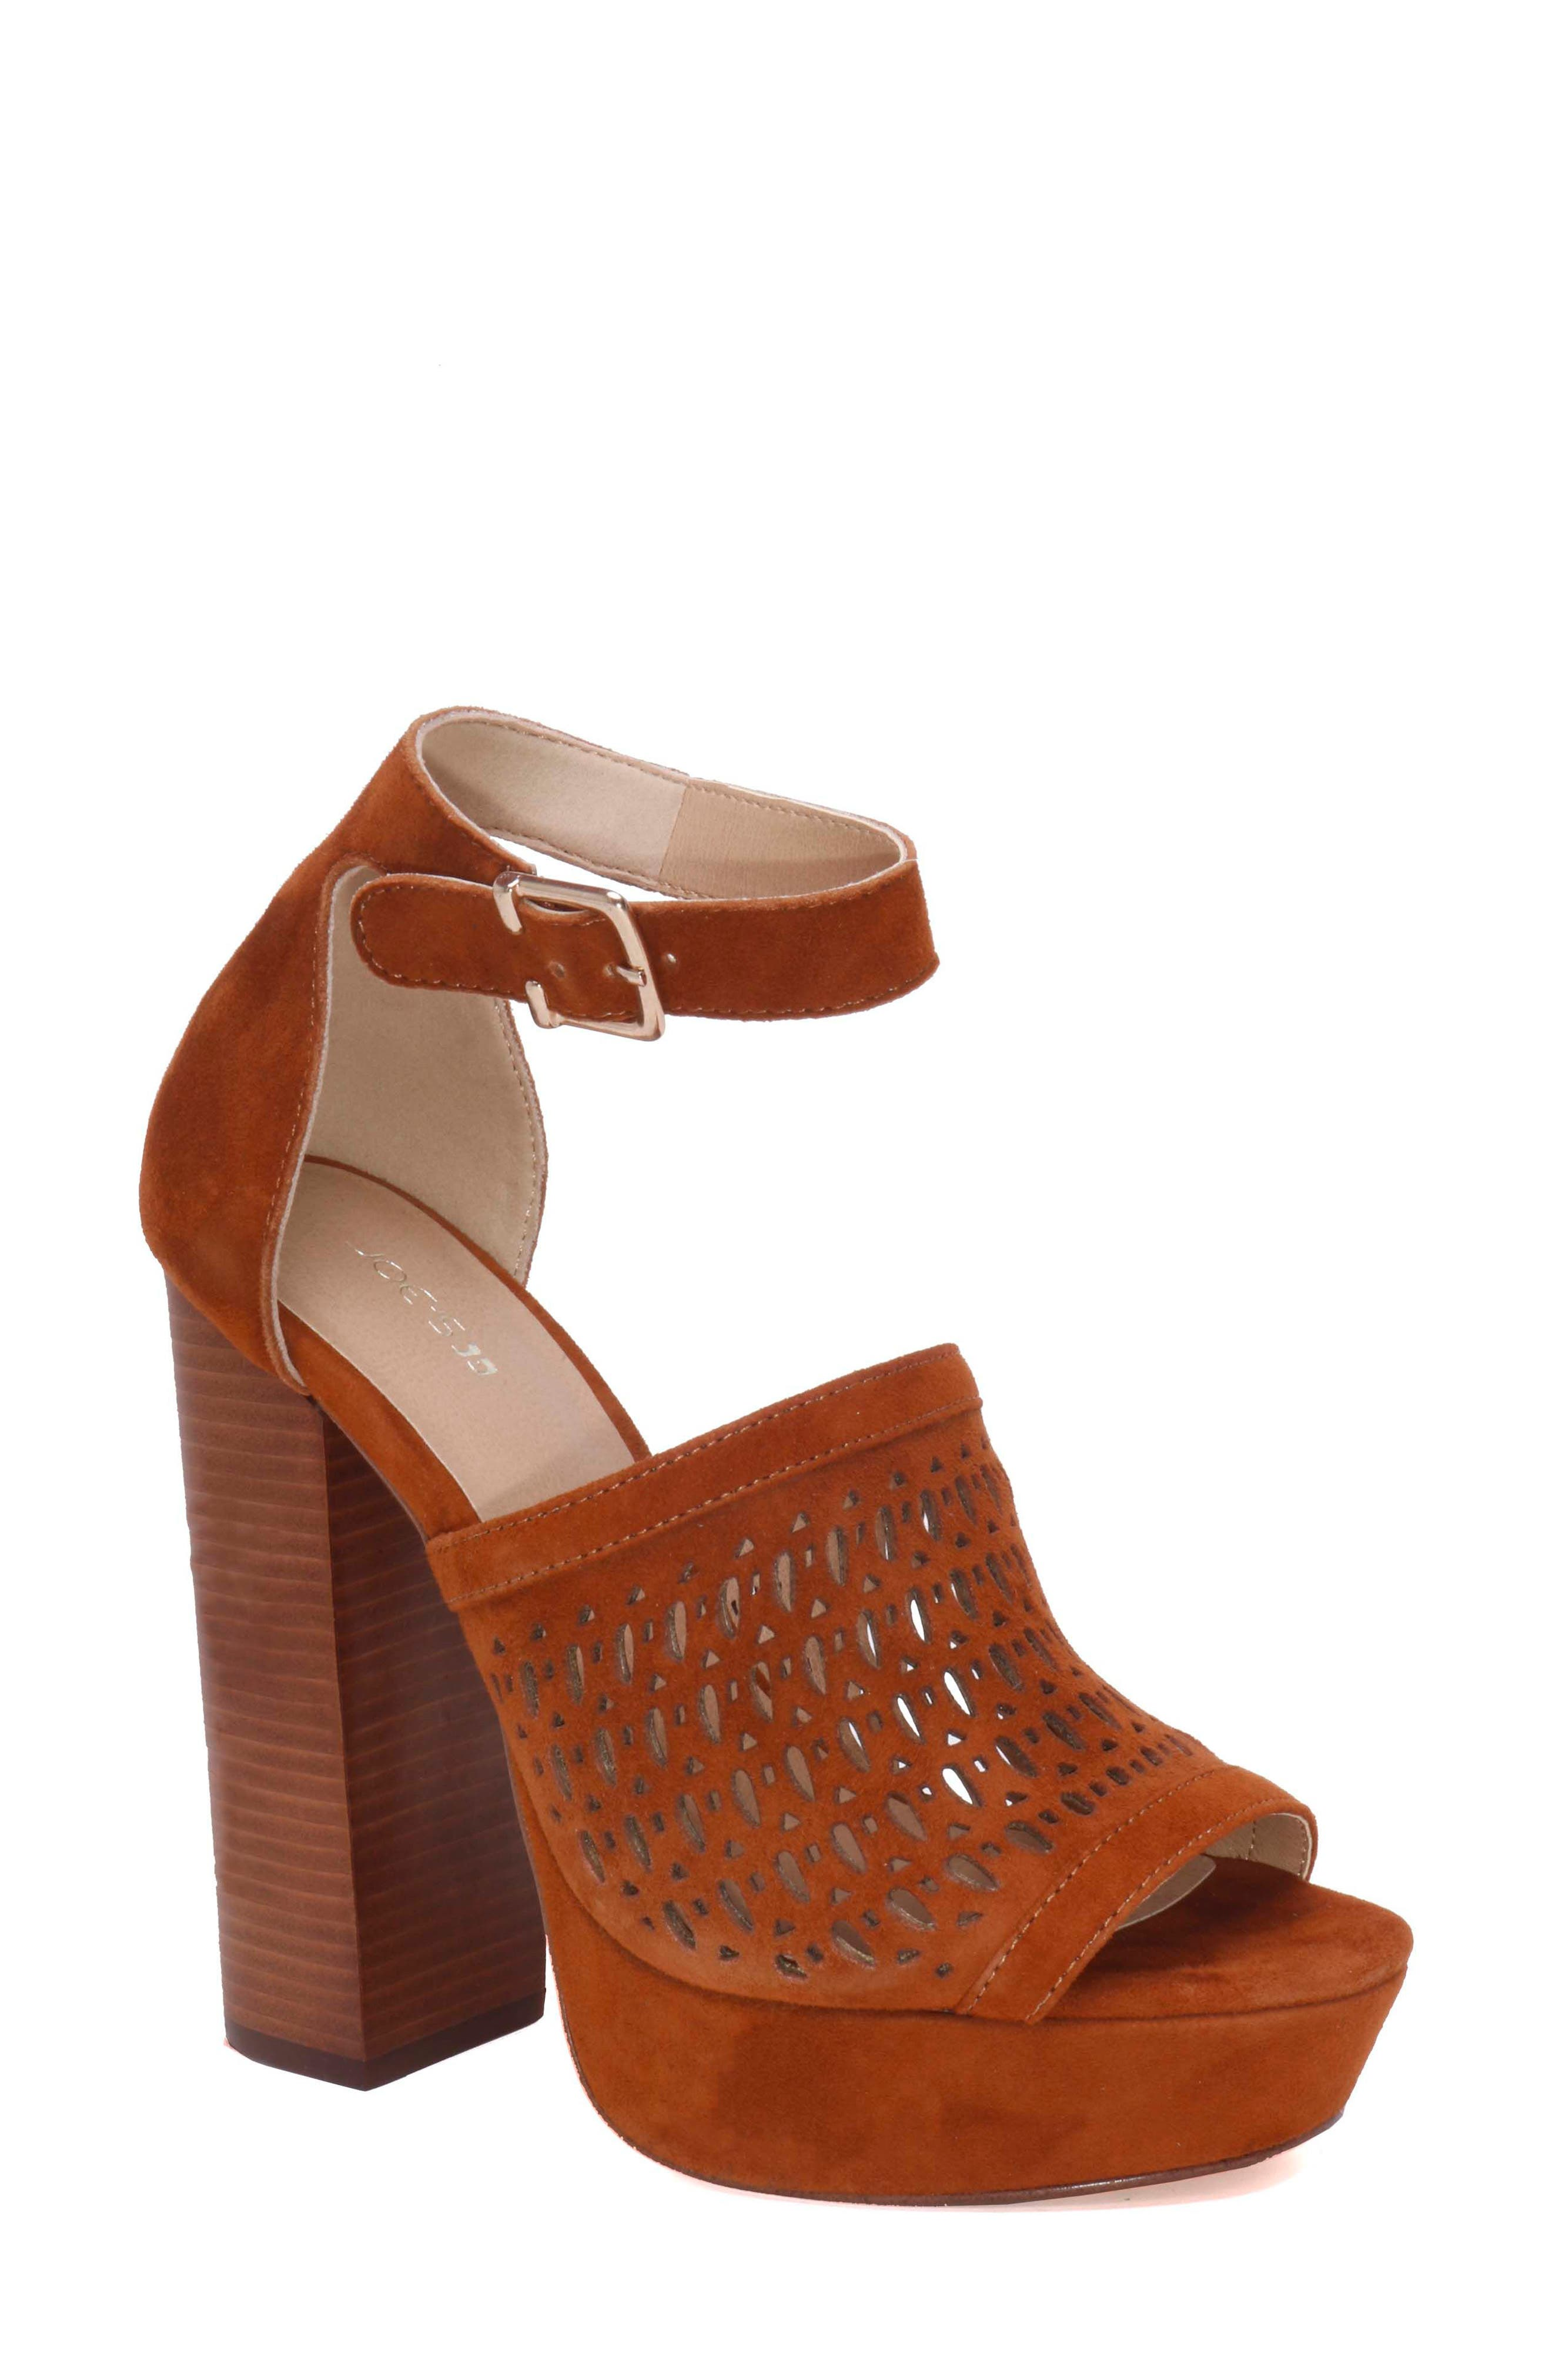 Lorne Platform Sandal,                             Main thumbnail 1, color,